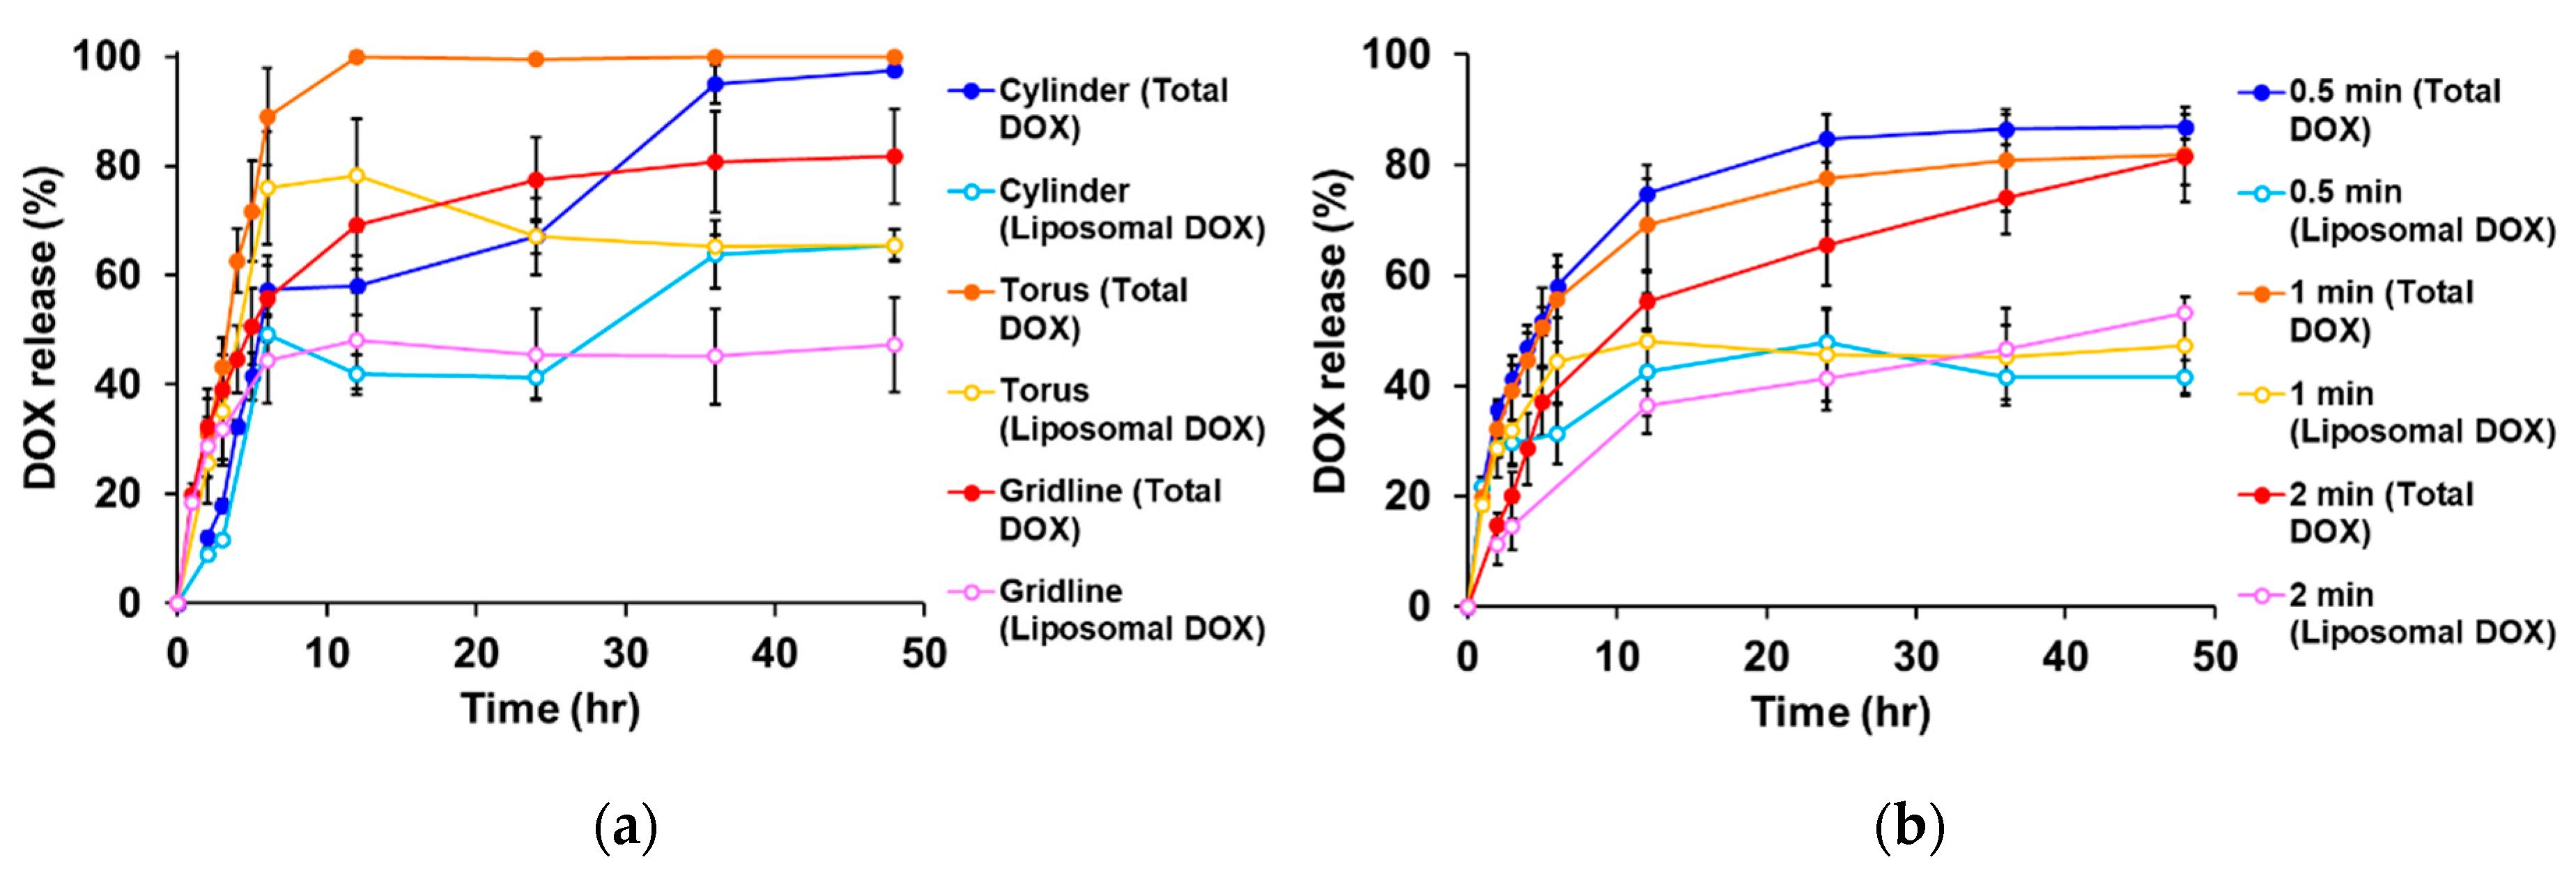 Drug release profiles by geometry and UV exposure. Image via Nagoya City University.